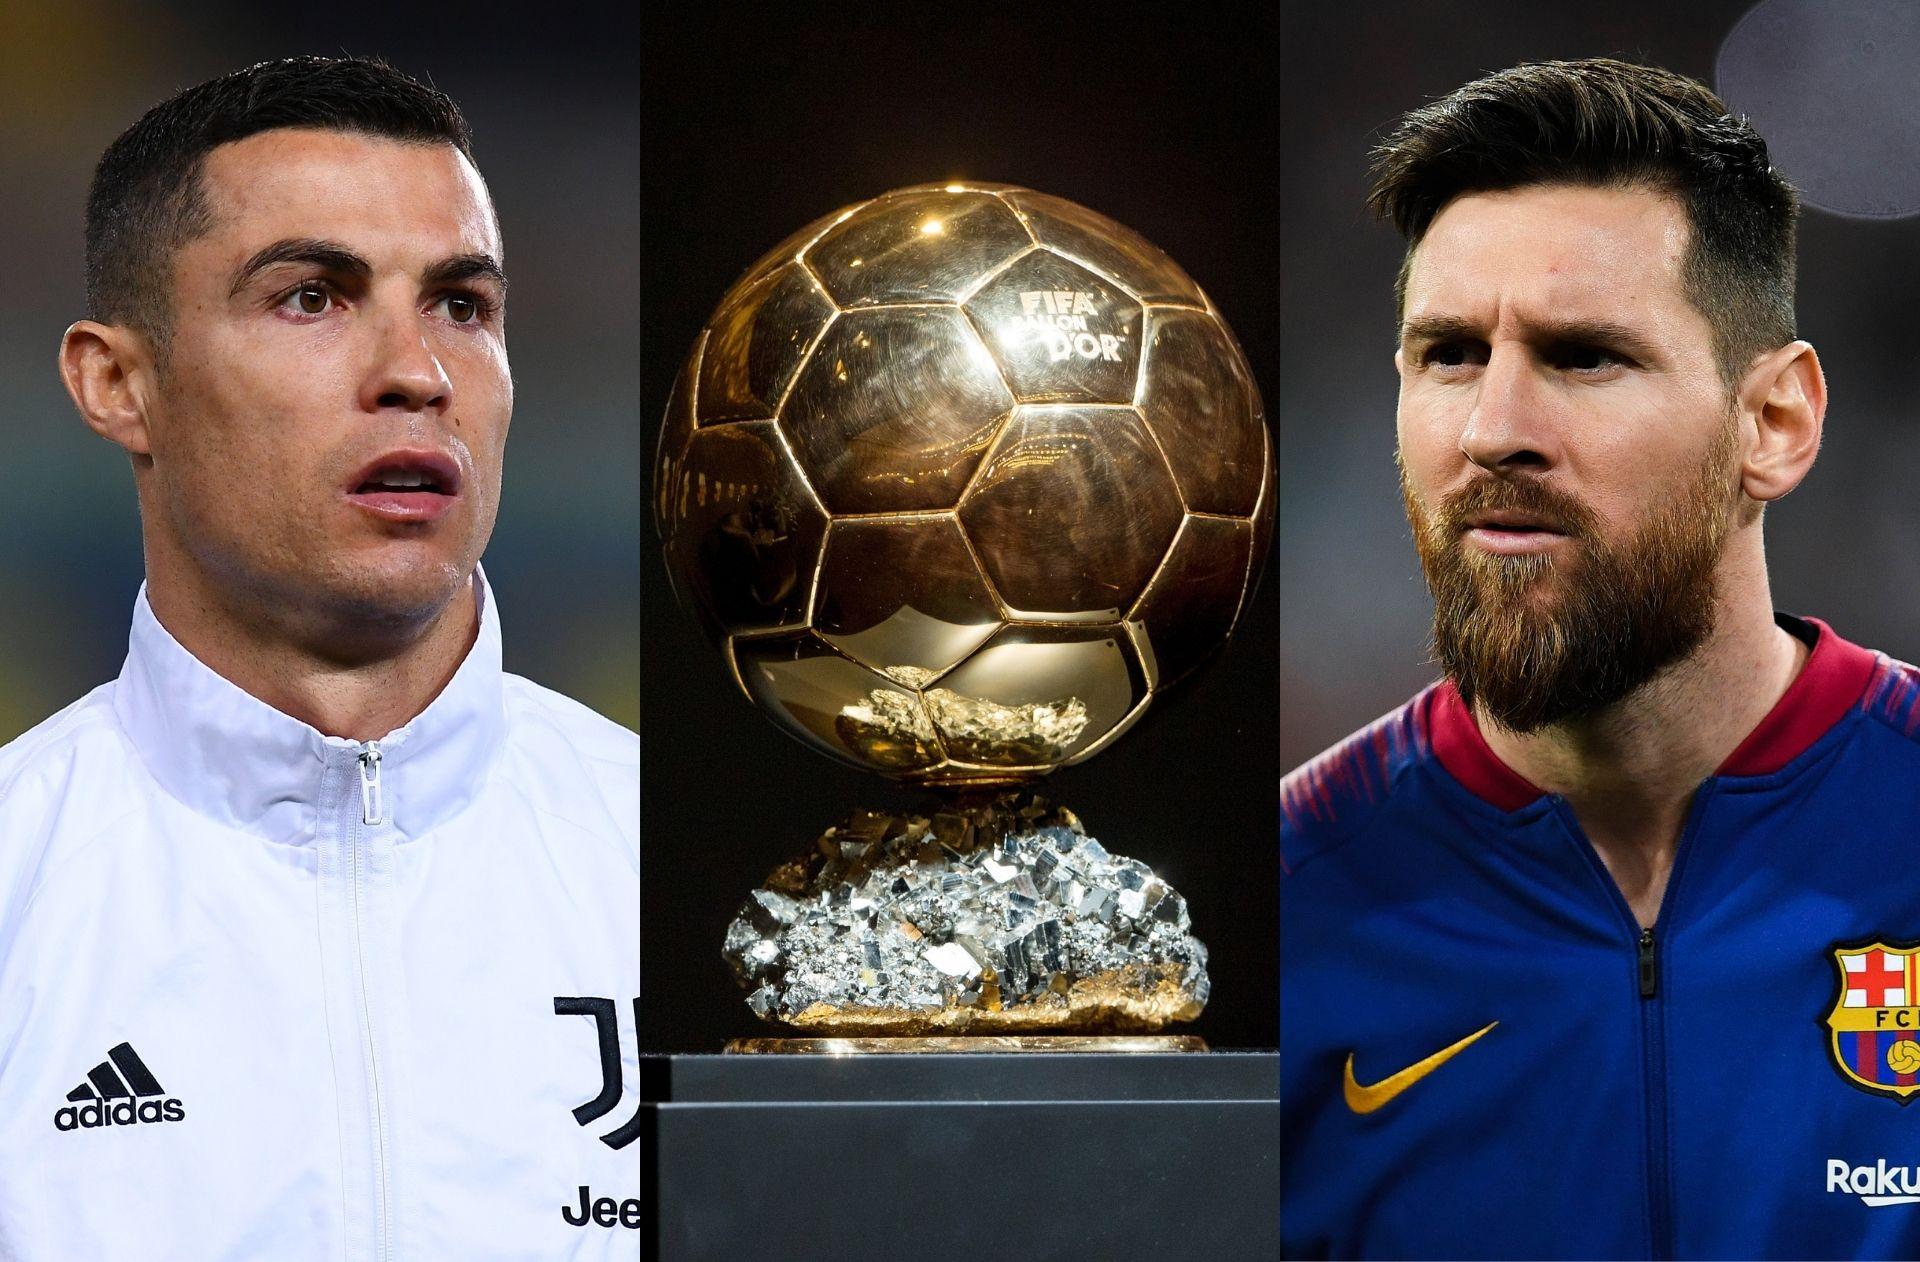 Ballon d'Or Power Rankings - The 10 favorites